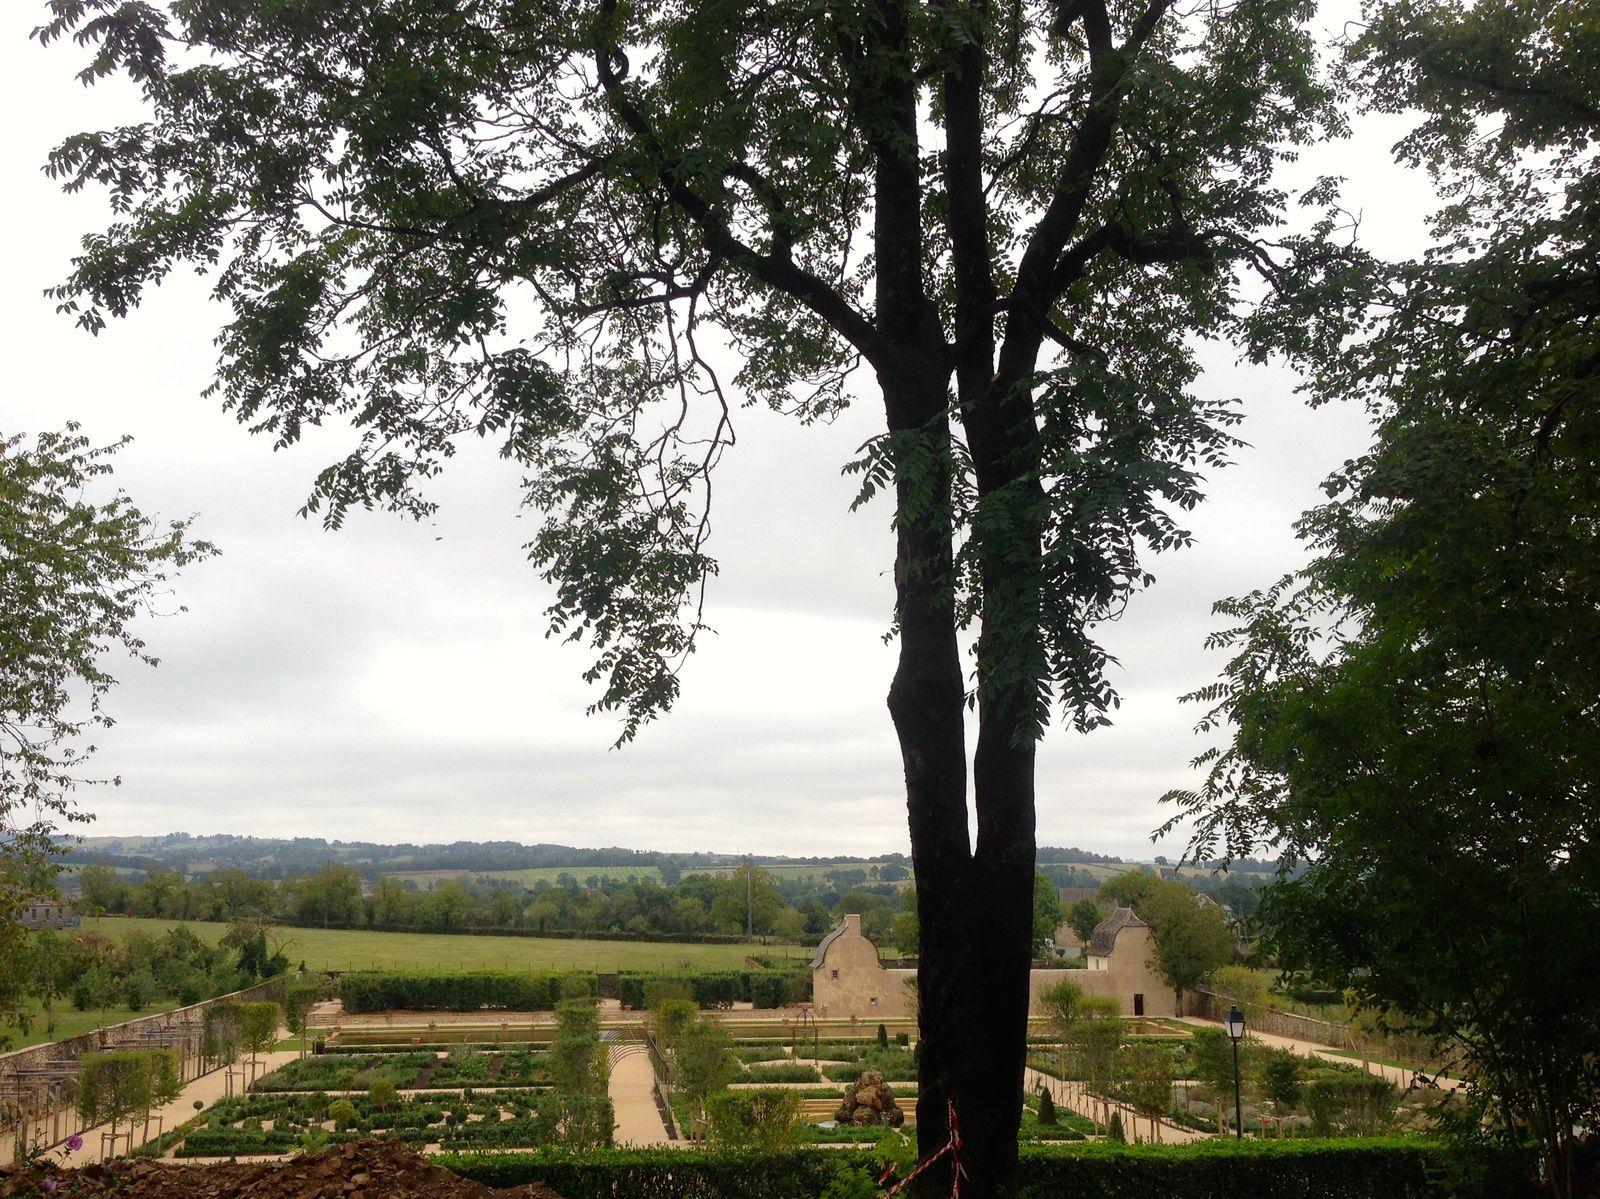 Jardins Renaissance du Château de Bournazel - Aveyron